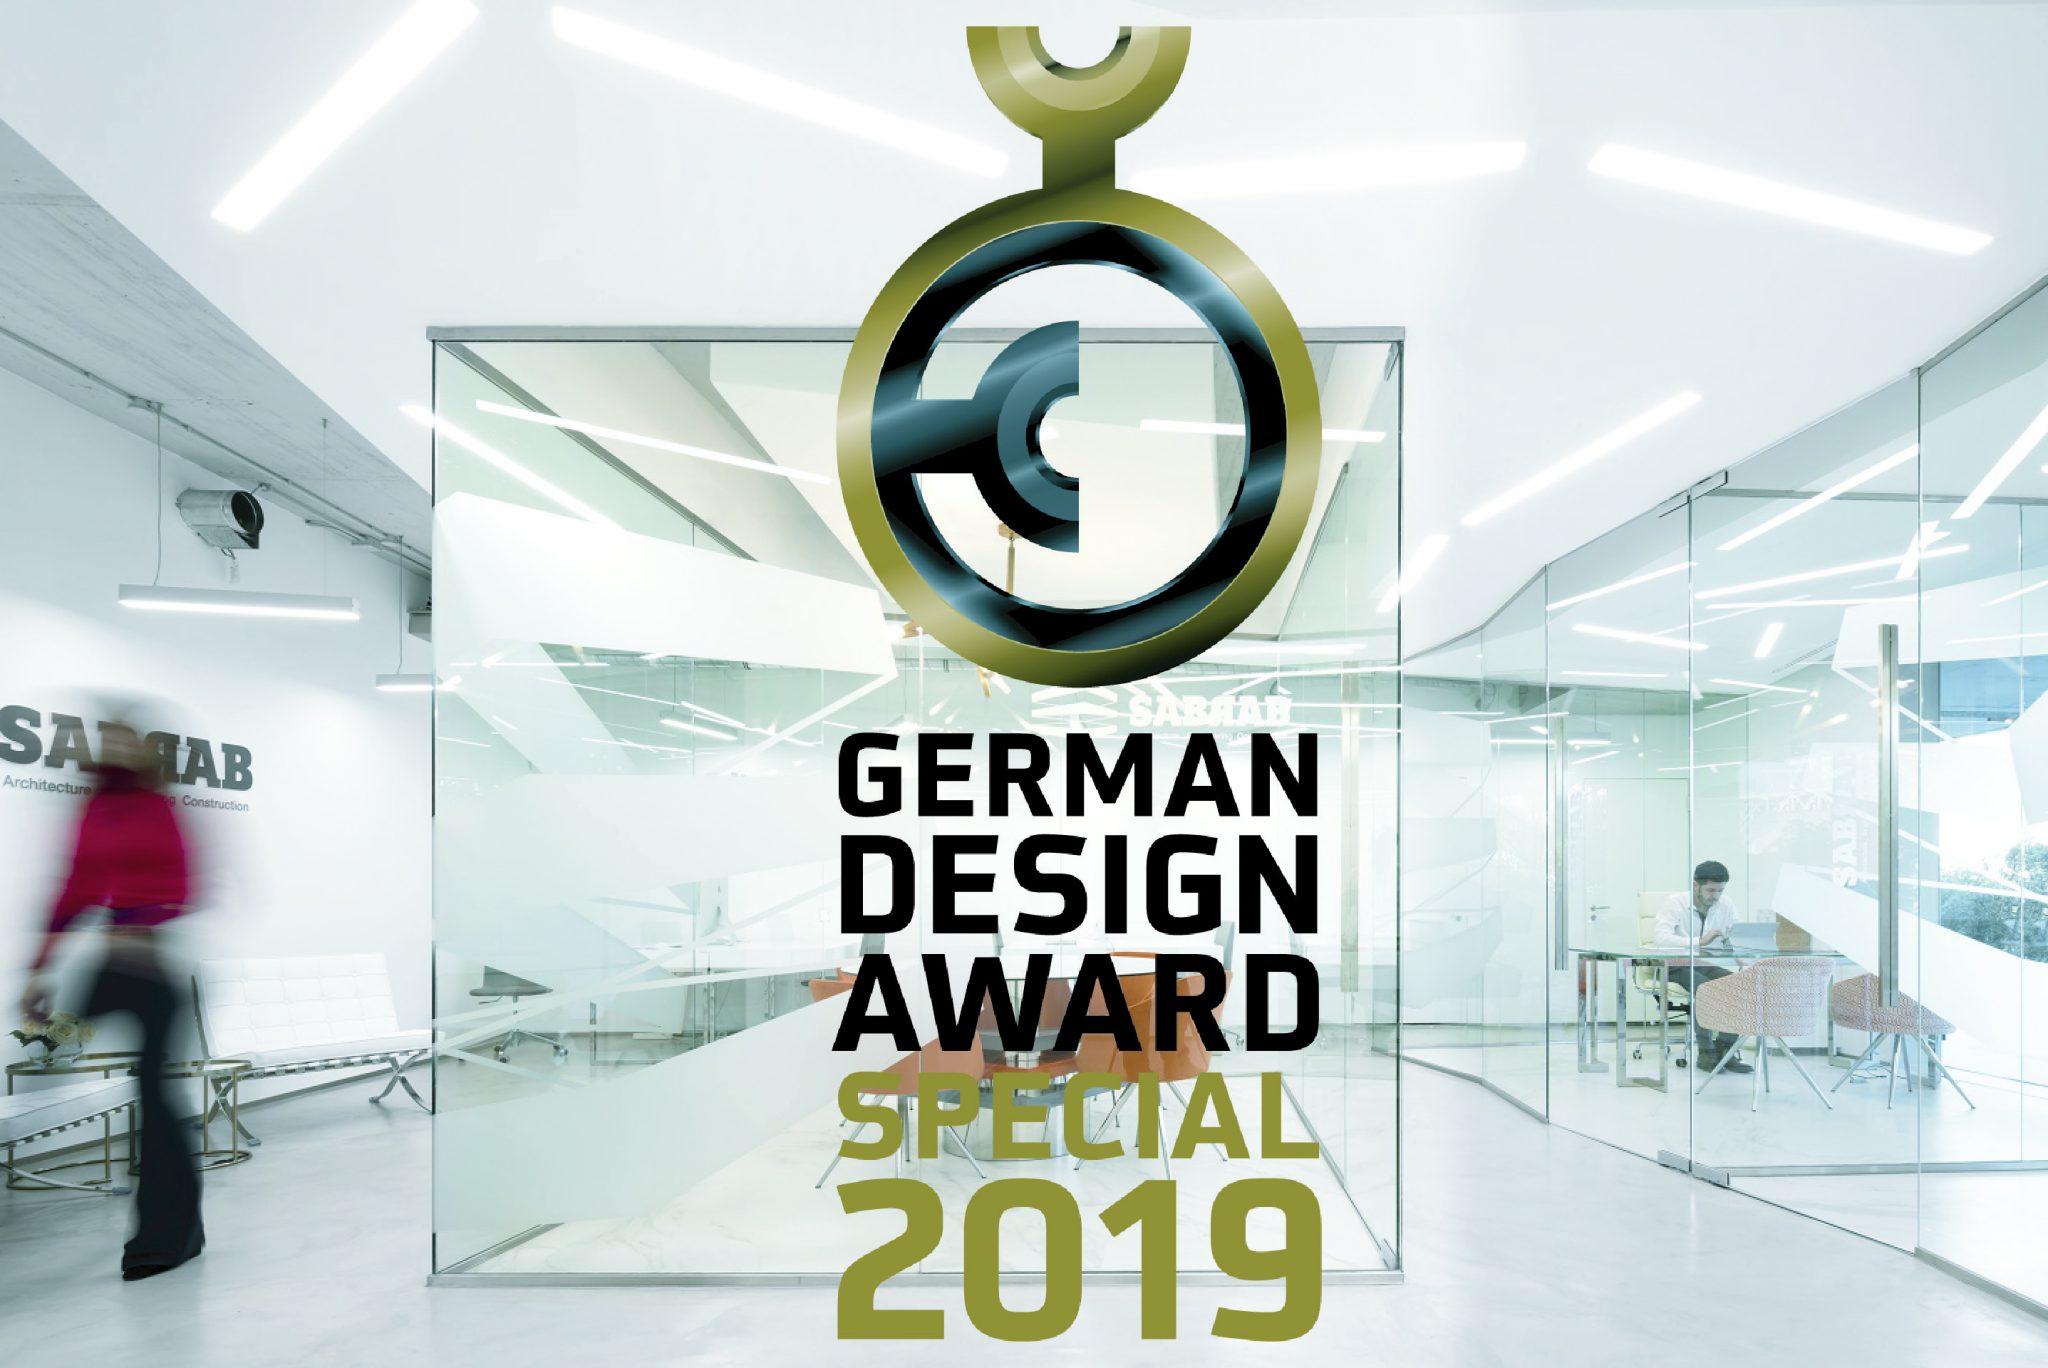 German design award portugal